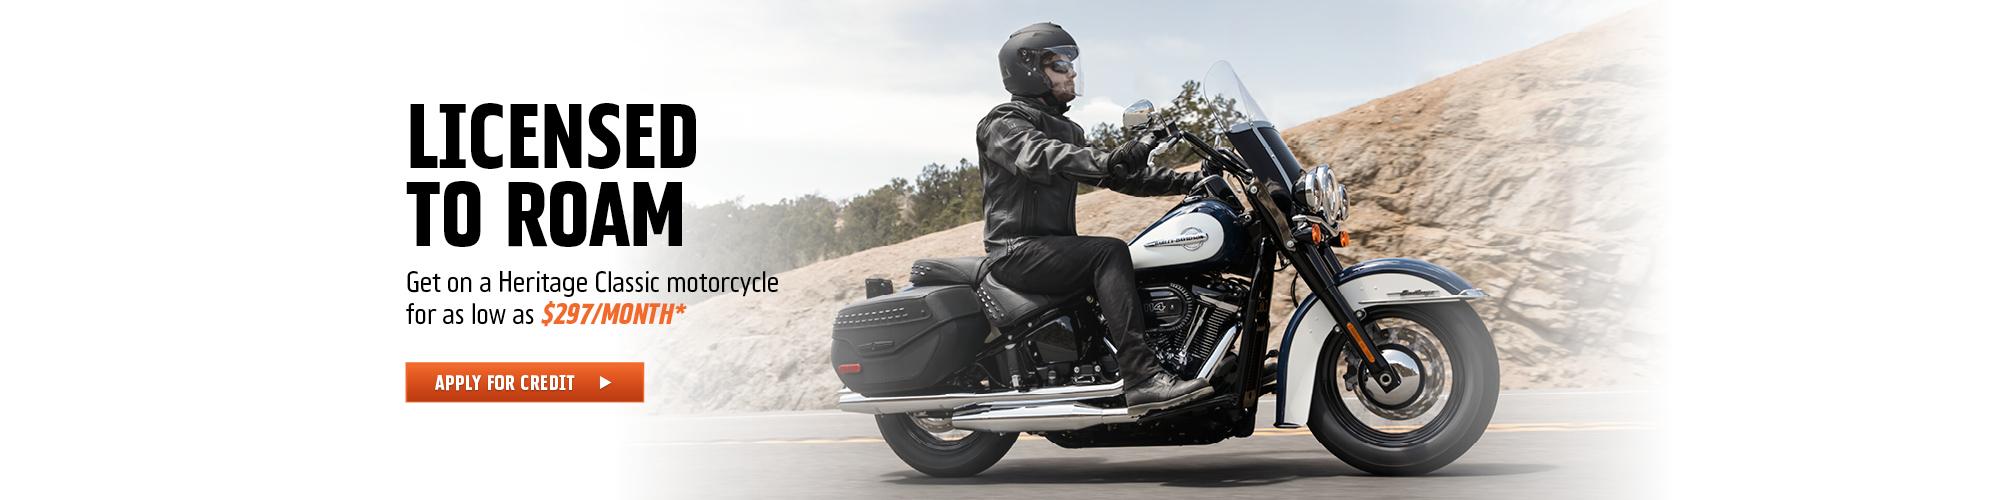 2019 Softail® Model Attainability Promotion at Thunder Harley-Davidson